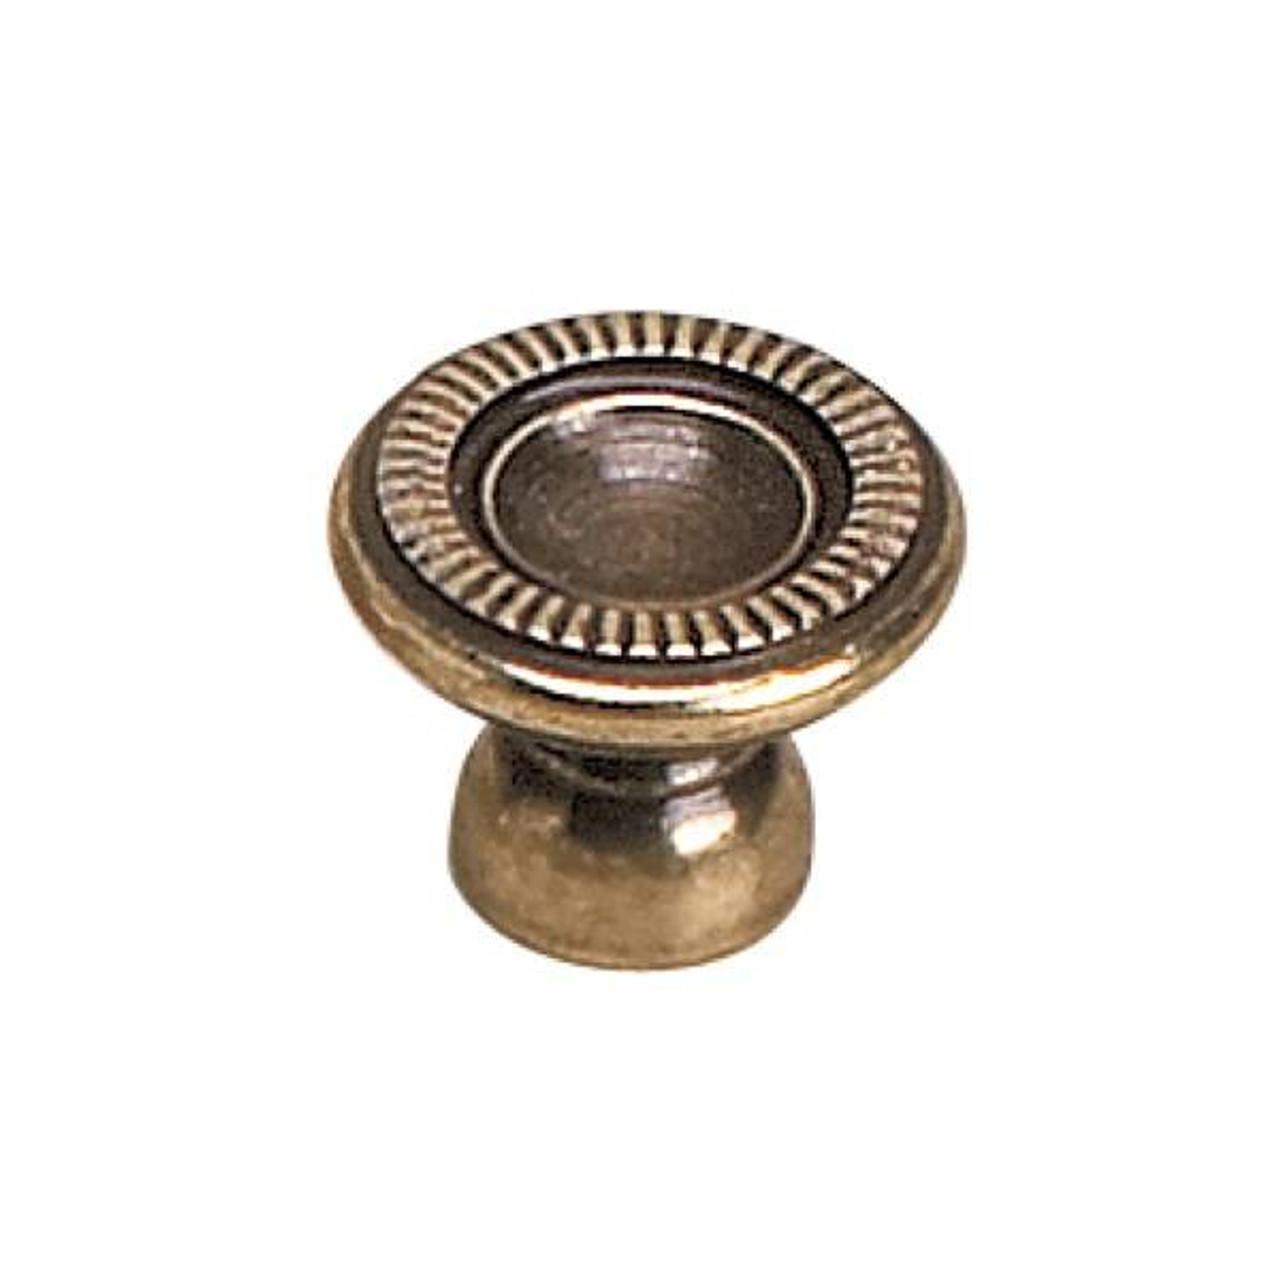 20mm Dia Classic Empire Style Ridged Edge Round Knob Burnished Brass Rlu 2440520bb